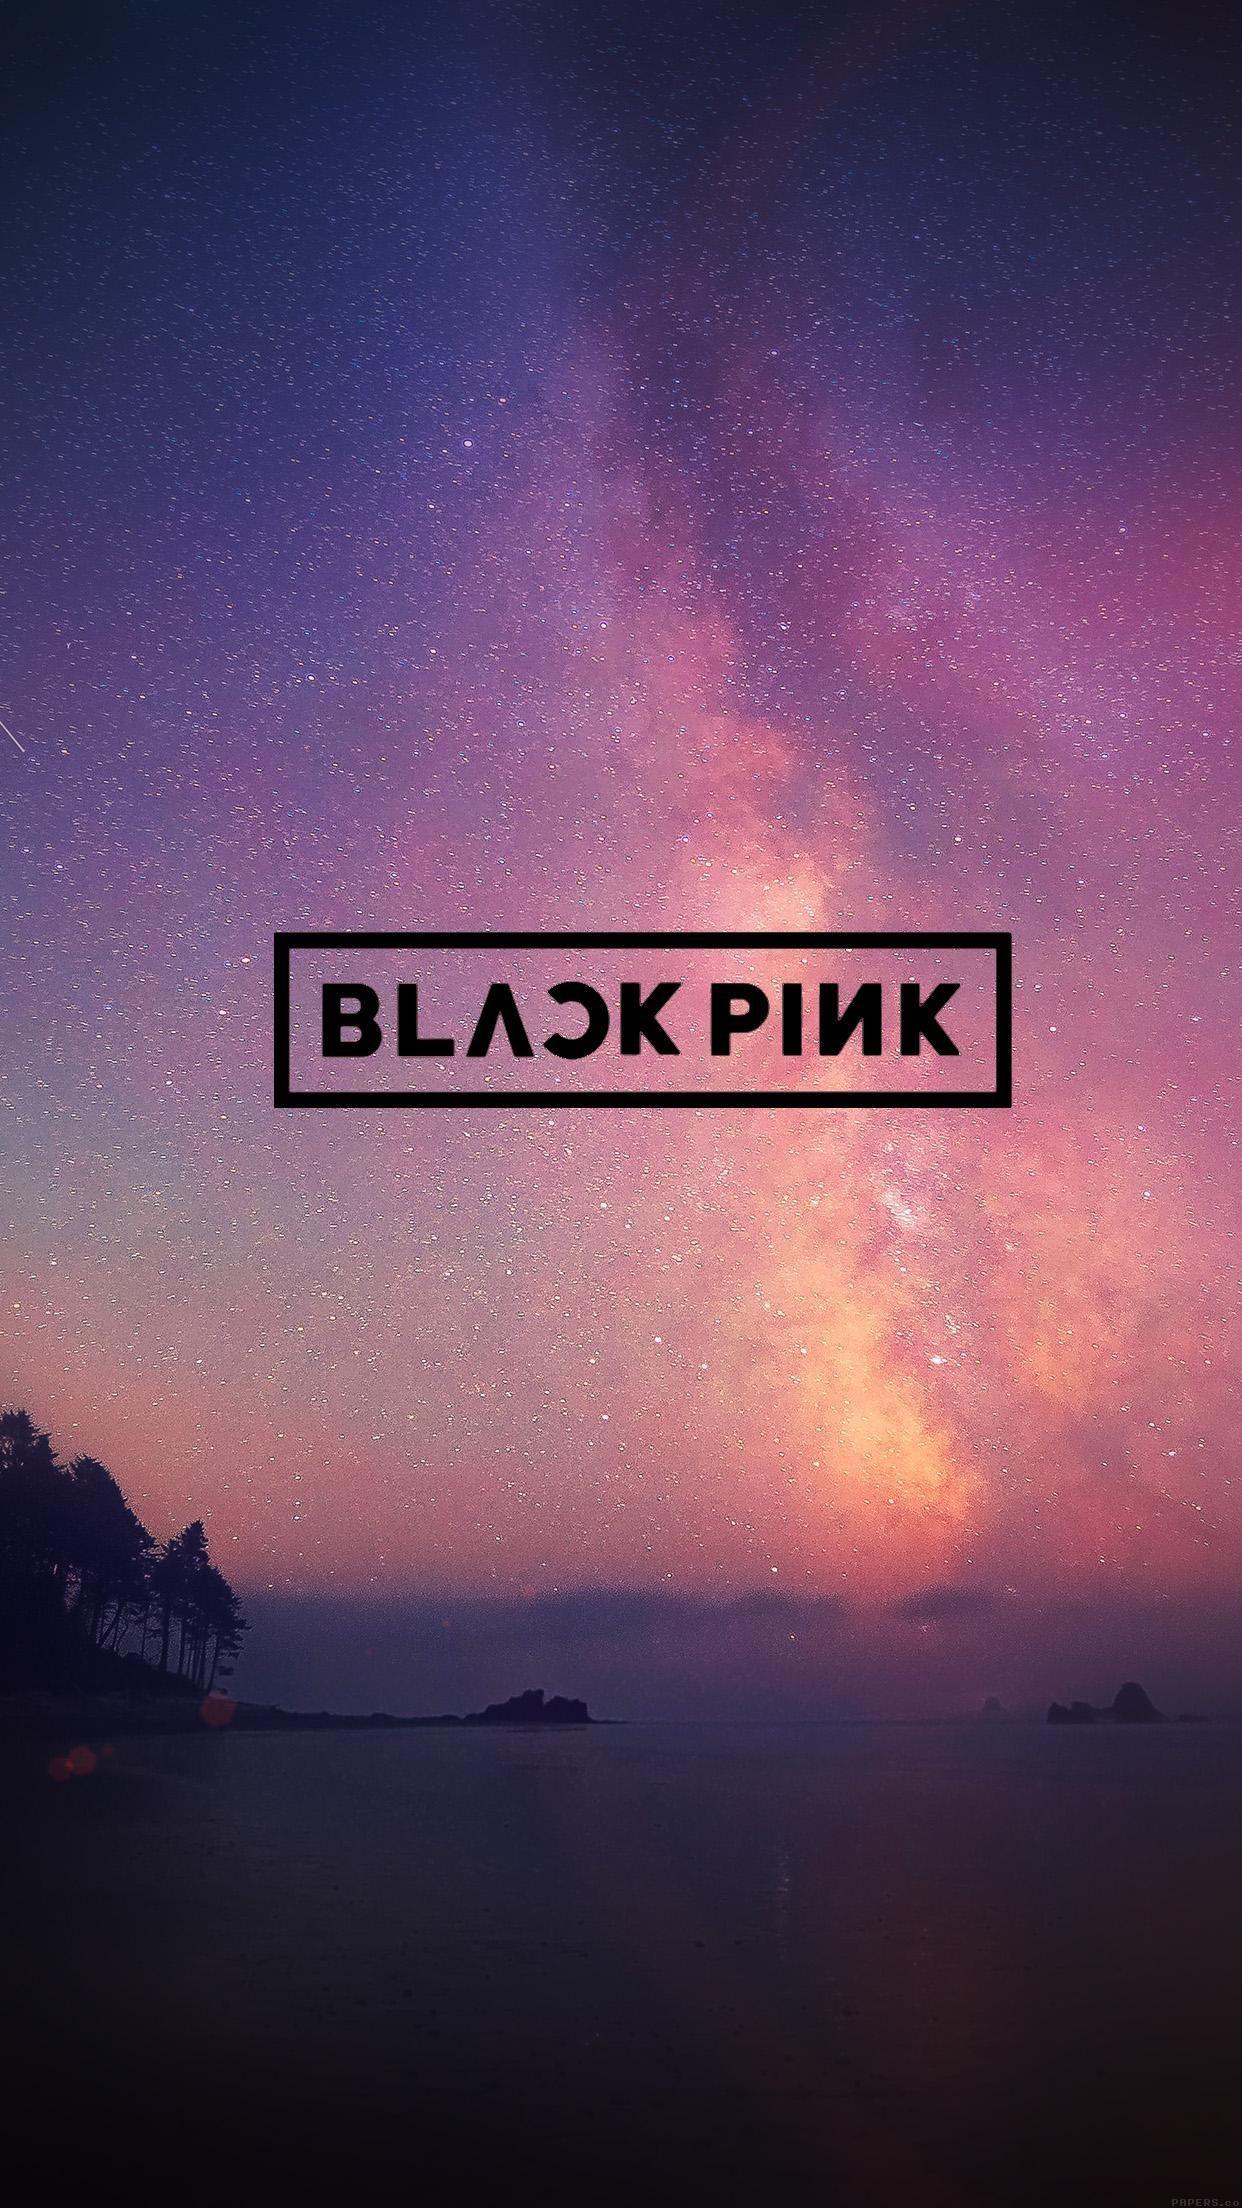 Download Blackpink Wallpaper Galaxy em 2020 Lisa